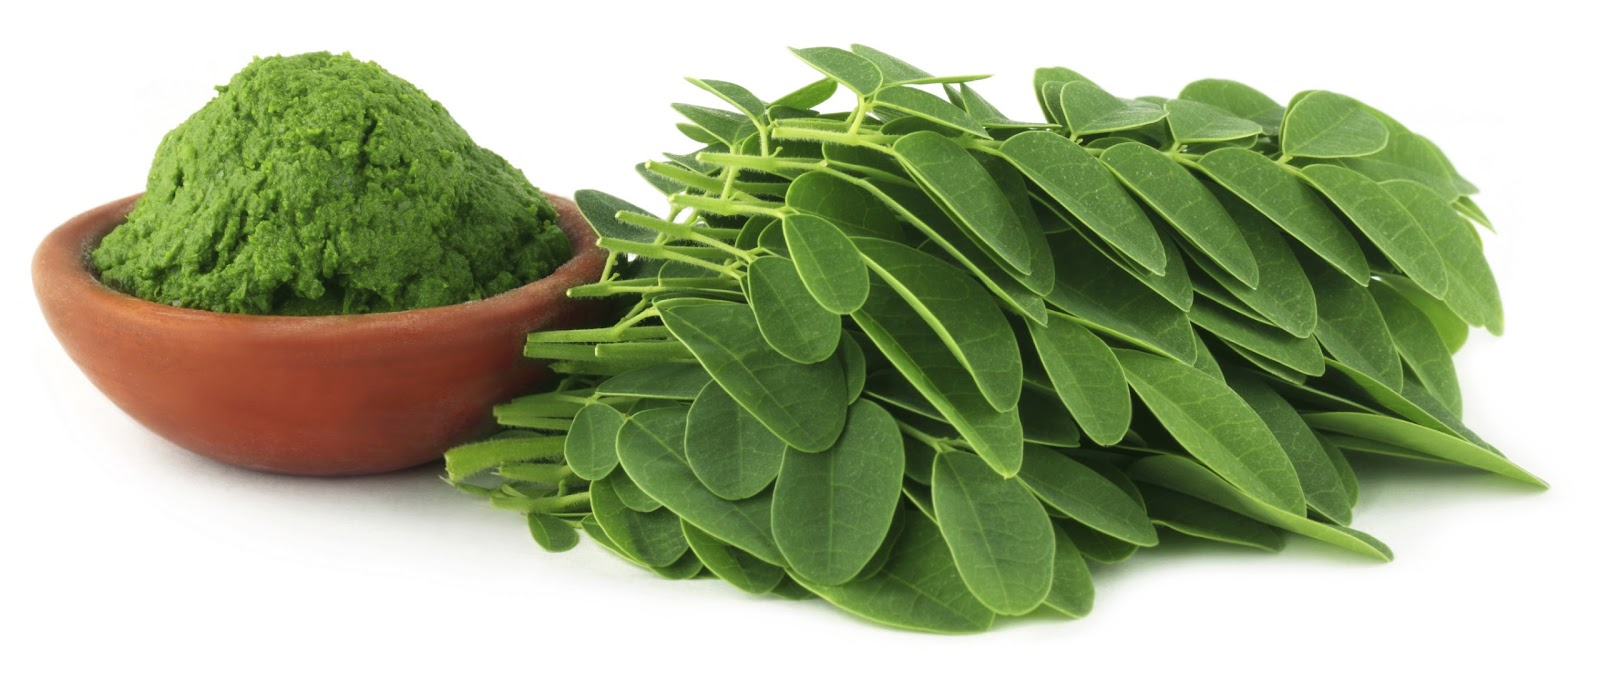 Kandungan daun Kelor dan manfaatnya